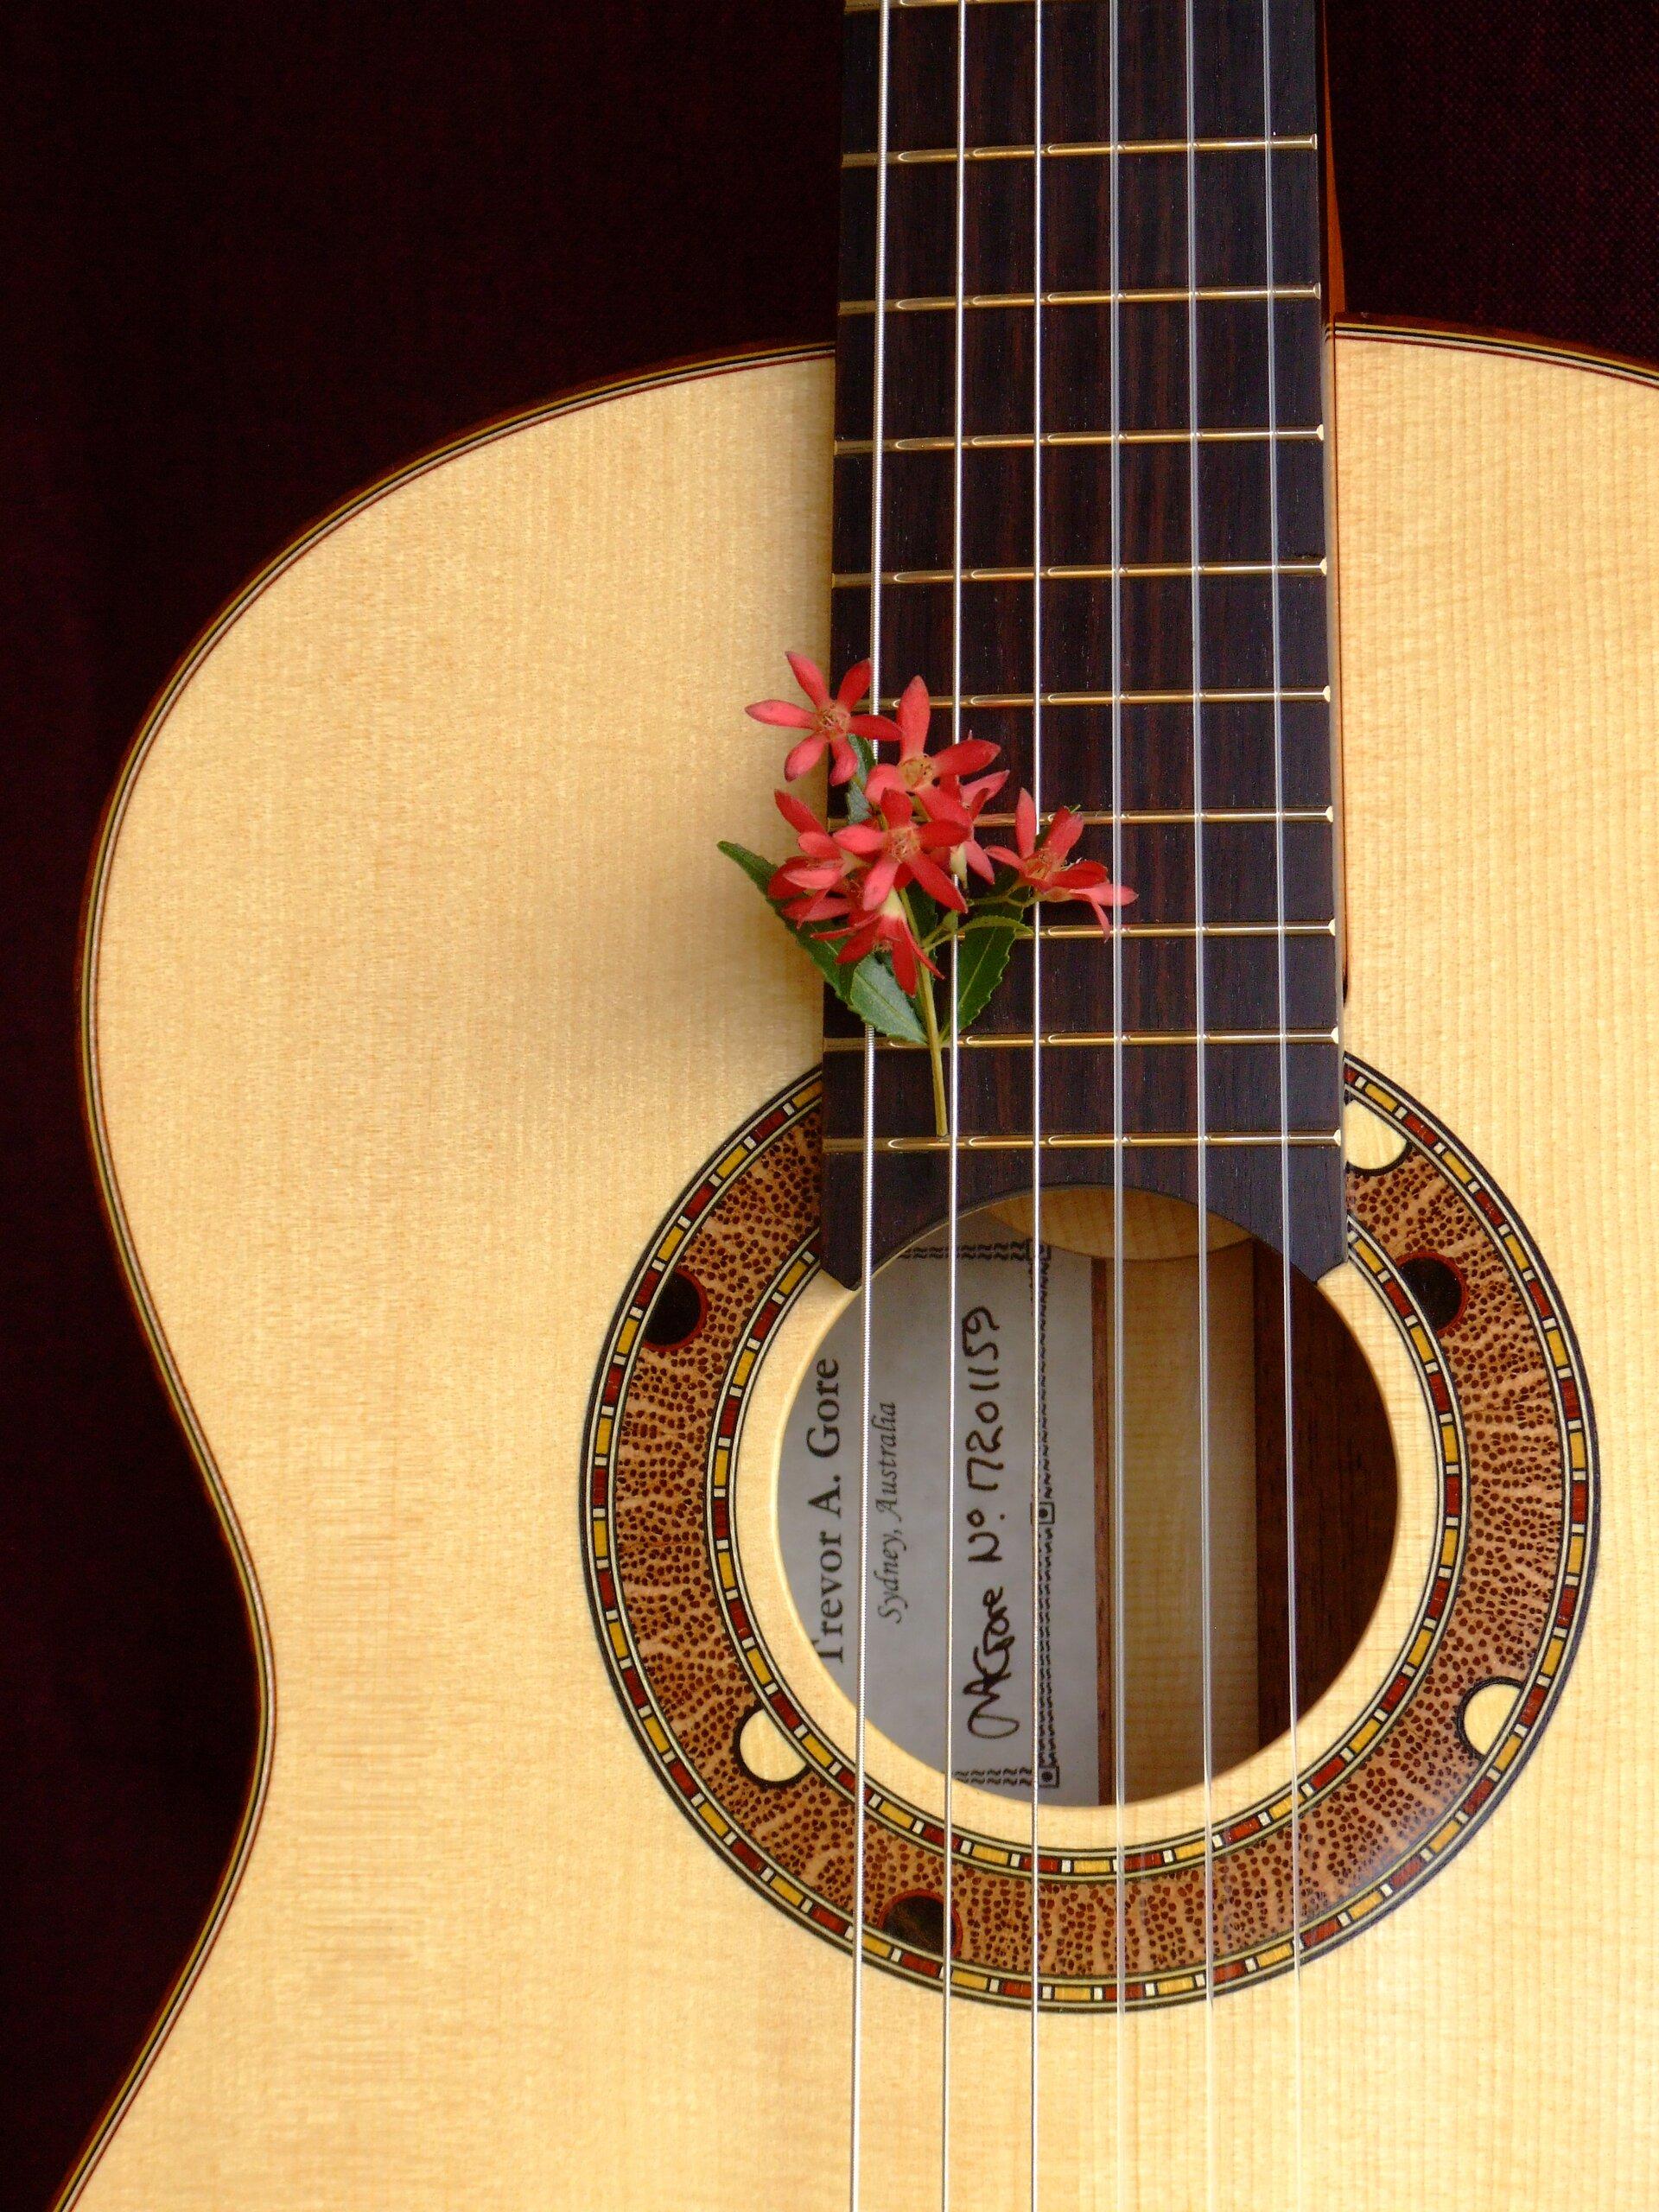 Australiana rosette in a spuce topped tilt-neck classical guitar with Christmas flower